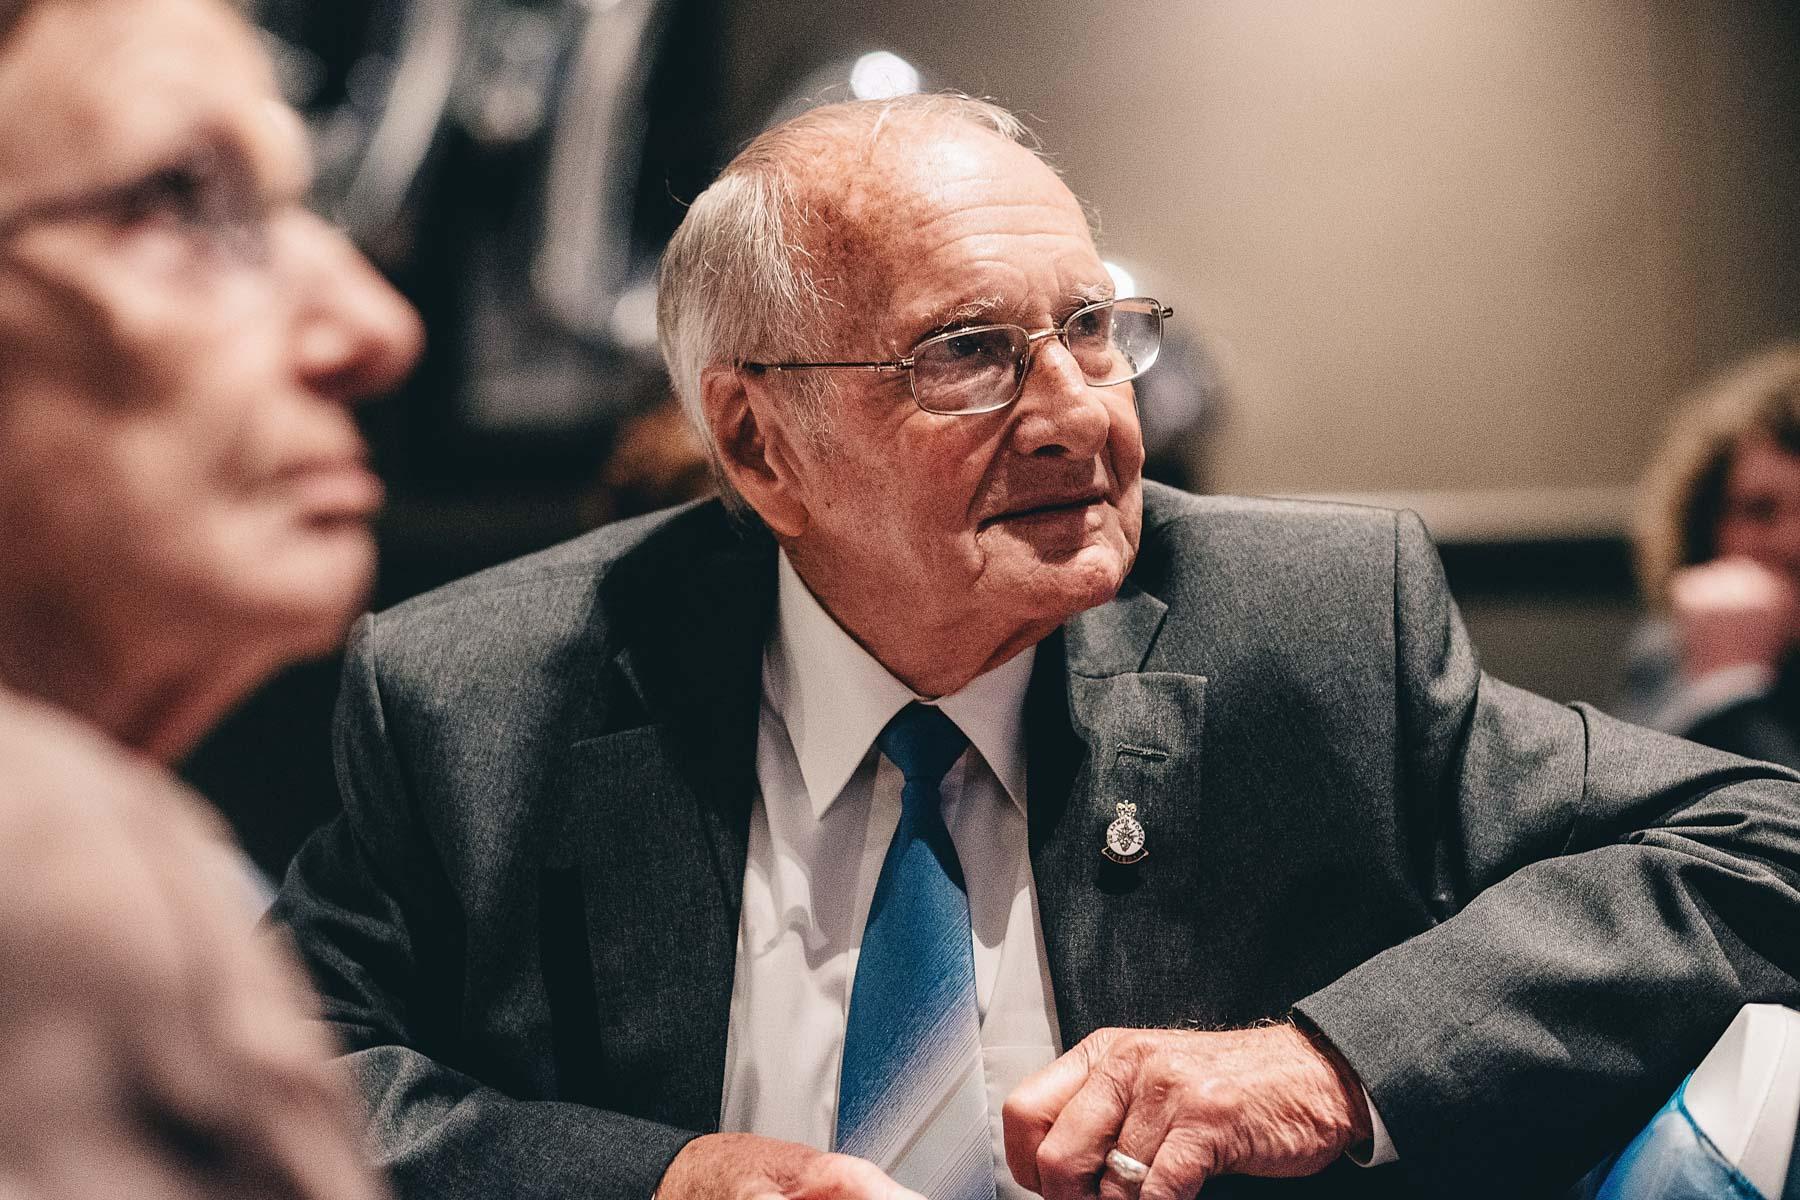 Grandad looks on with pride